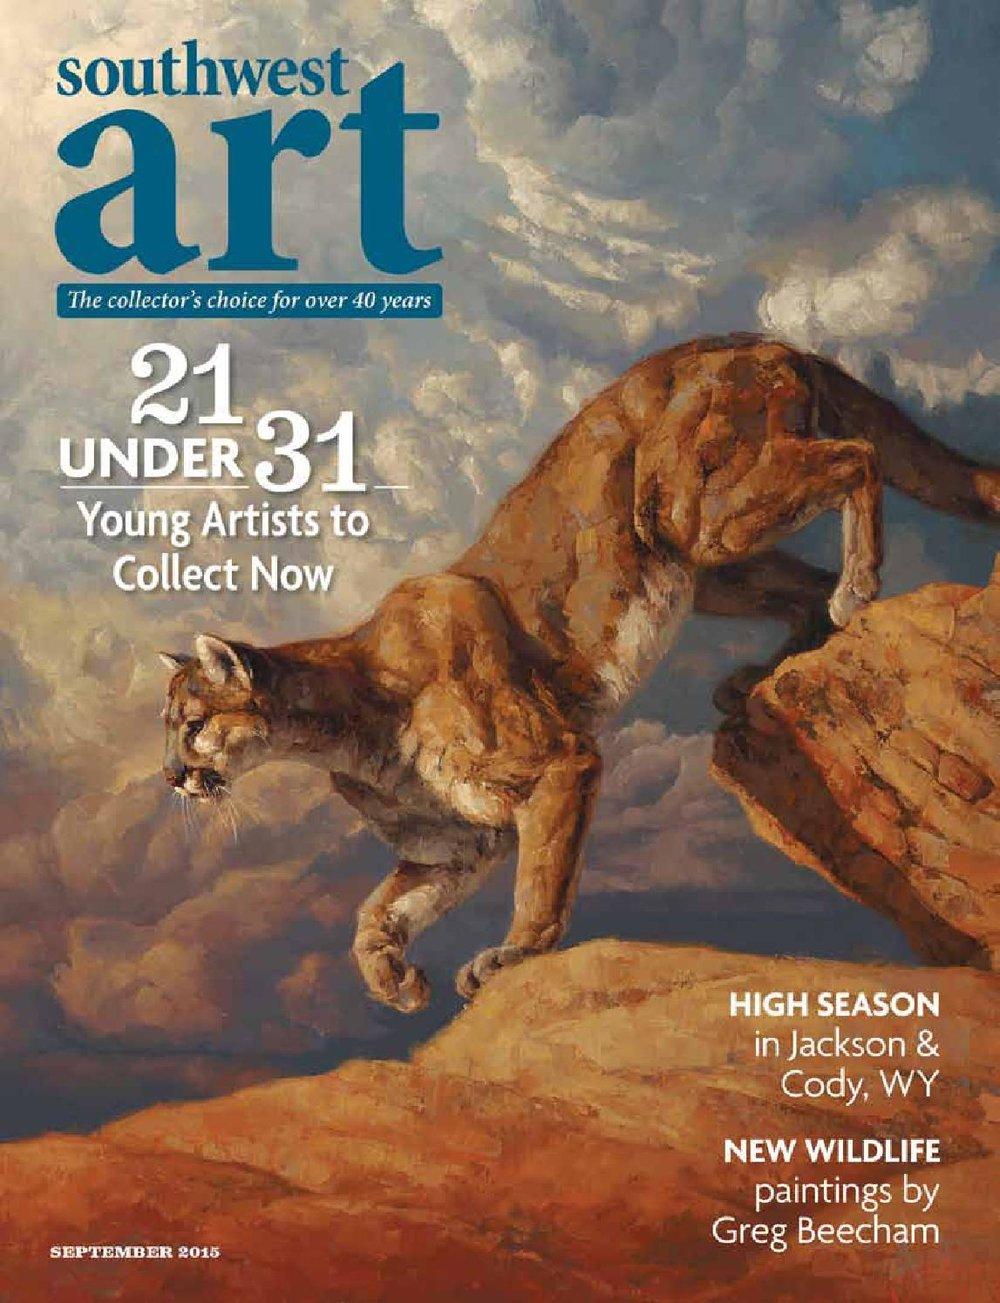 New Wildlife - September 2015Southwest Art Magazine • Western Art Collector Magazine